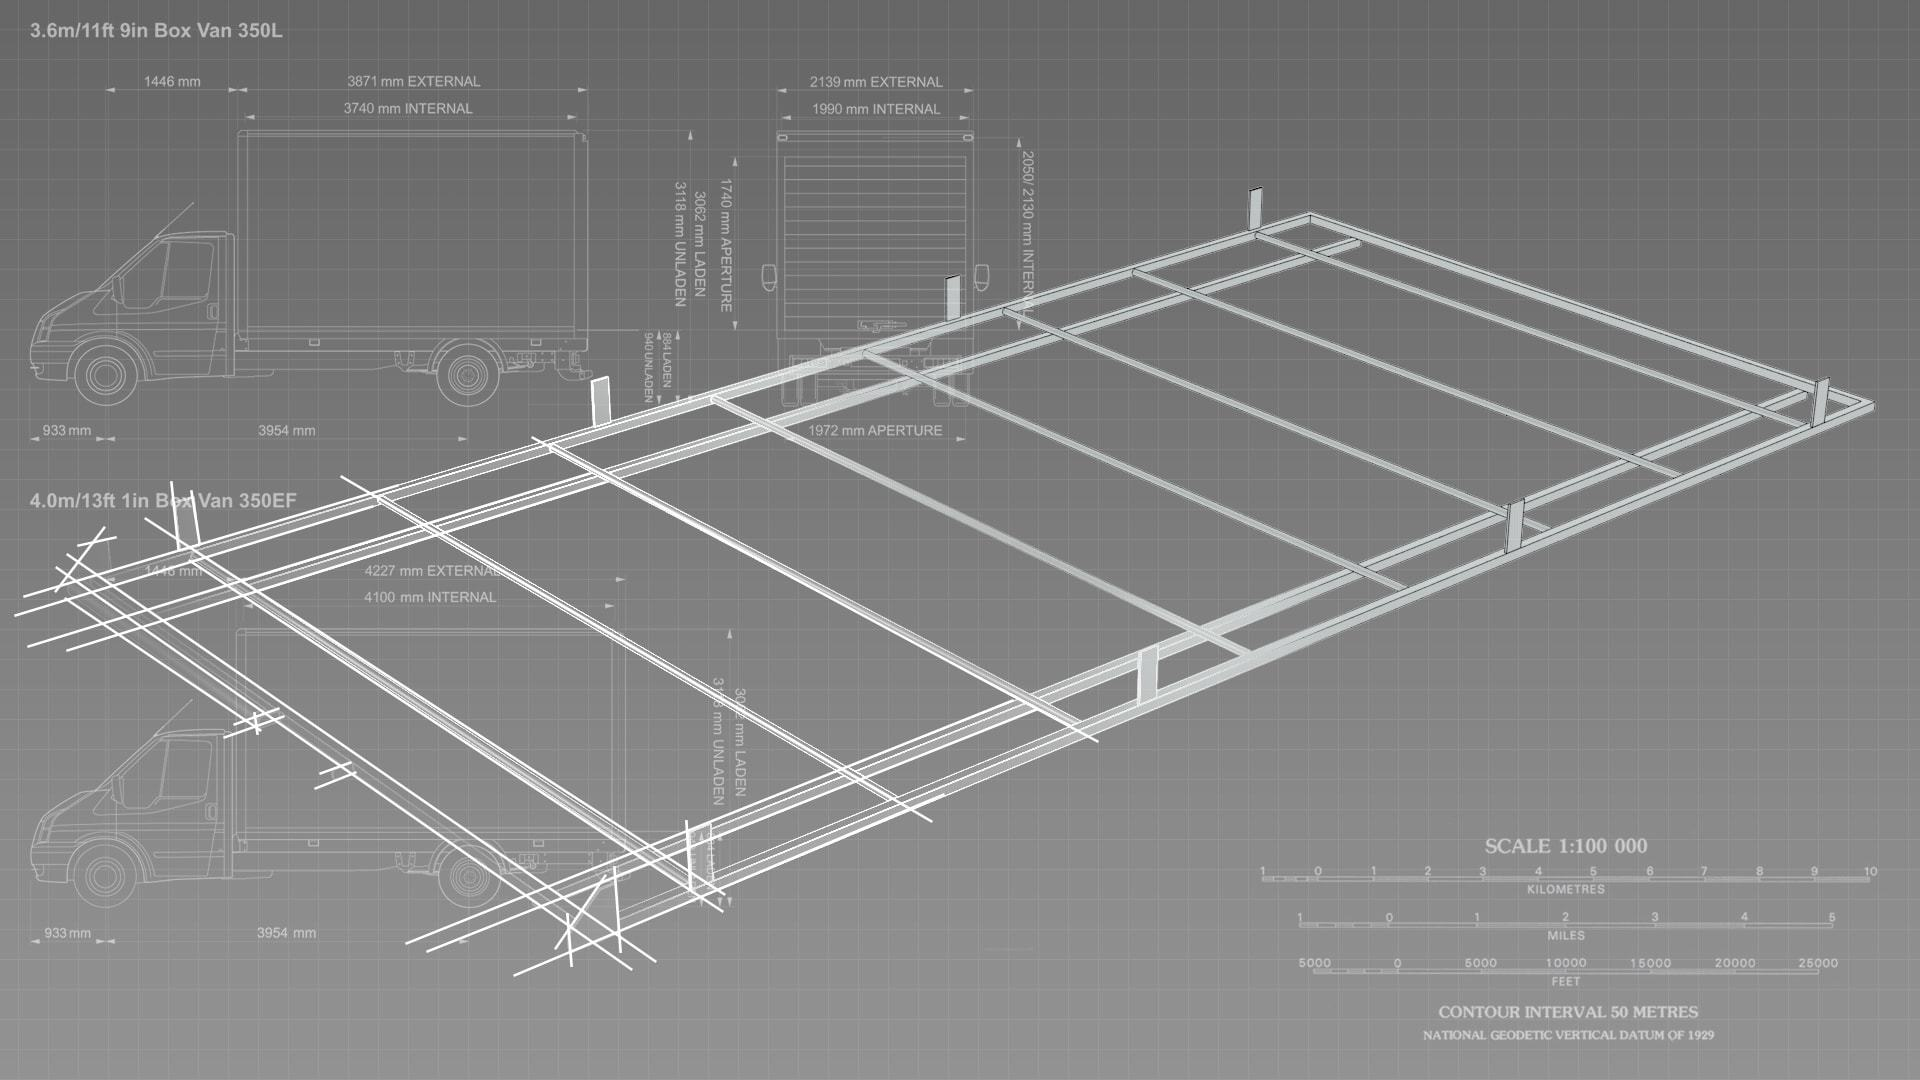 Sdv Roof Racks Heavy Duty Galvanised Steel Roof Racks